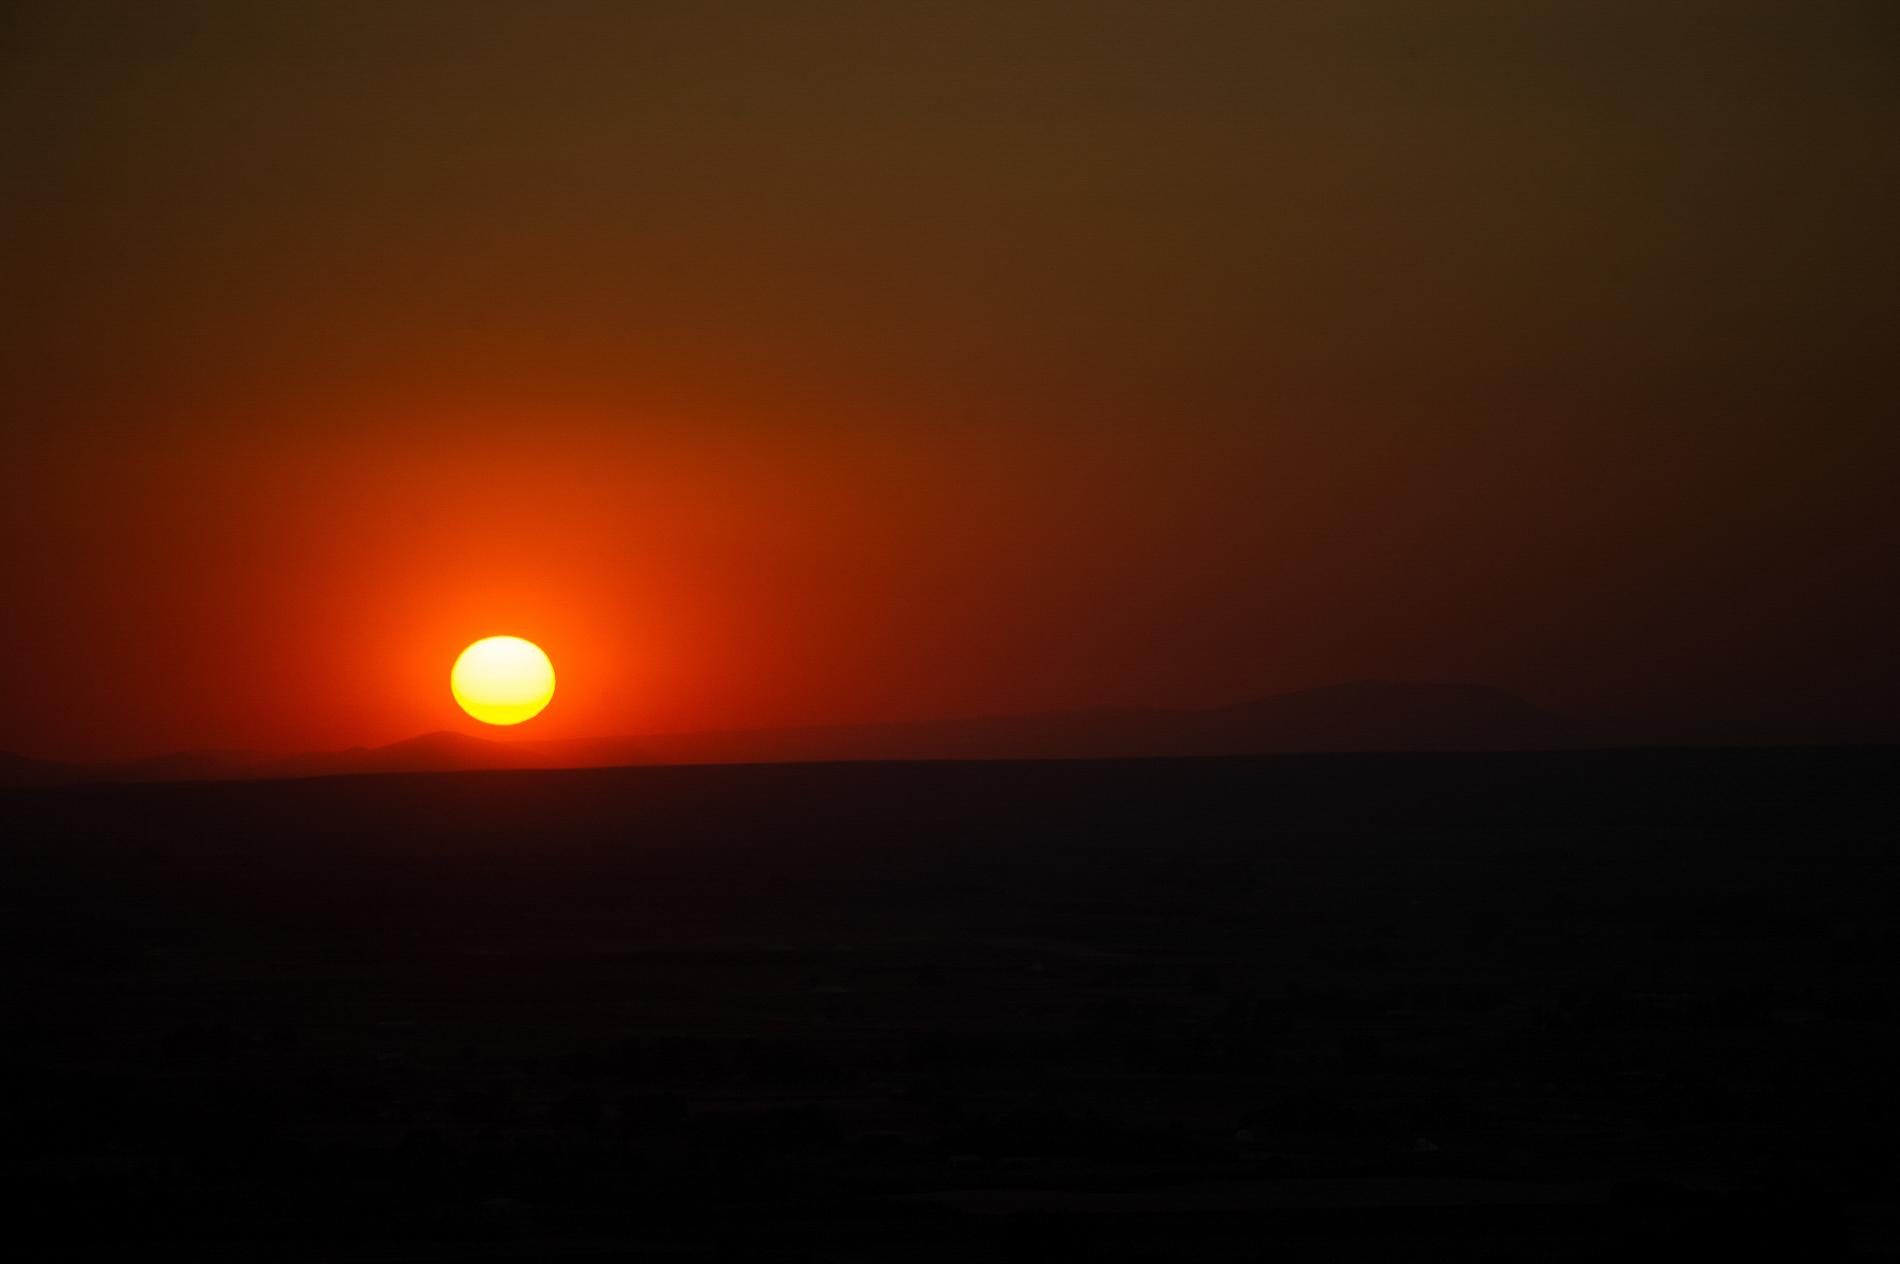 Sunset from a Chopper